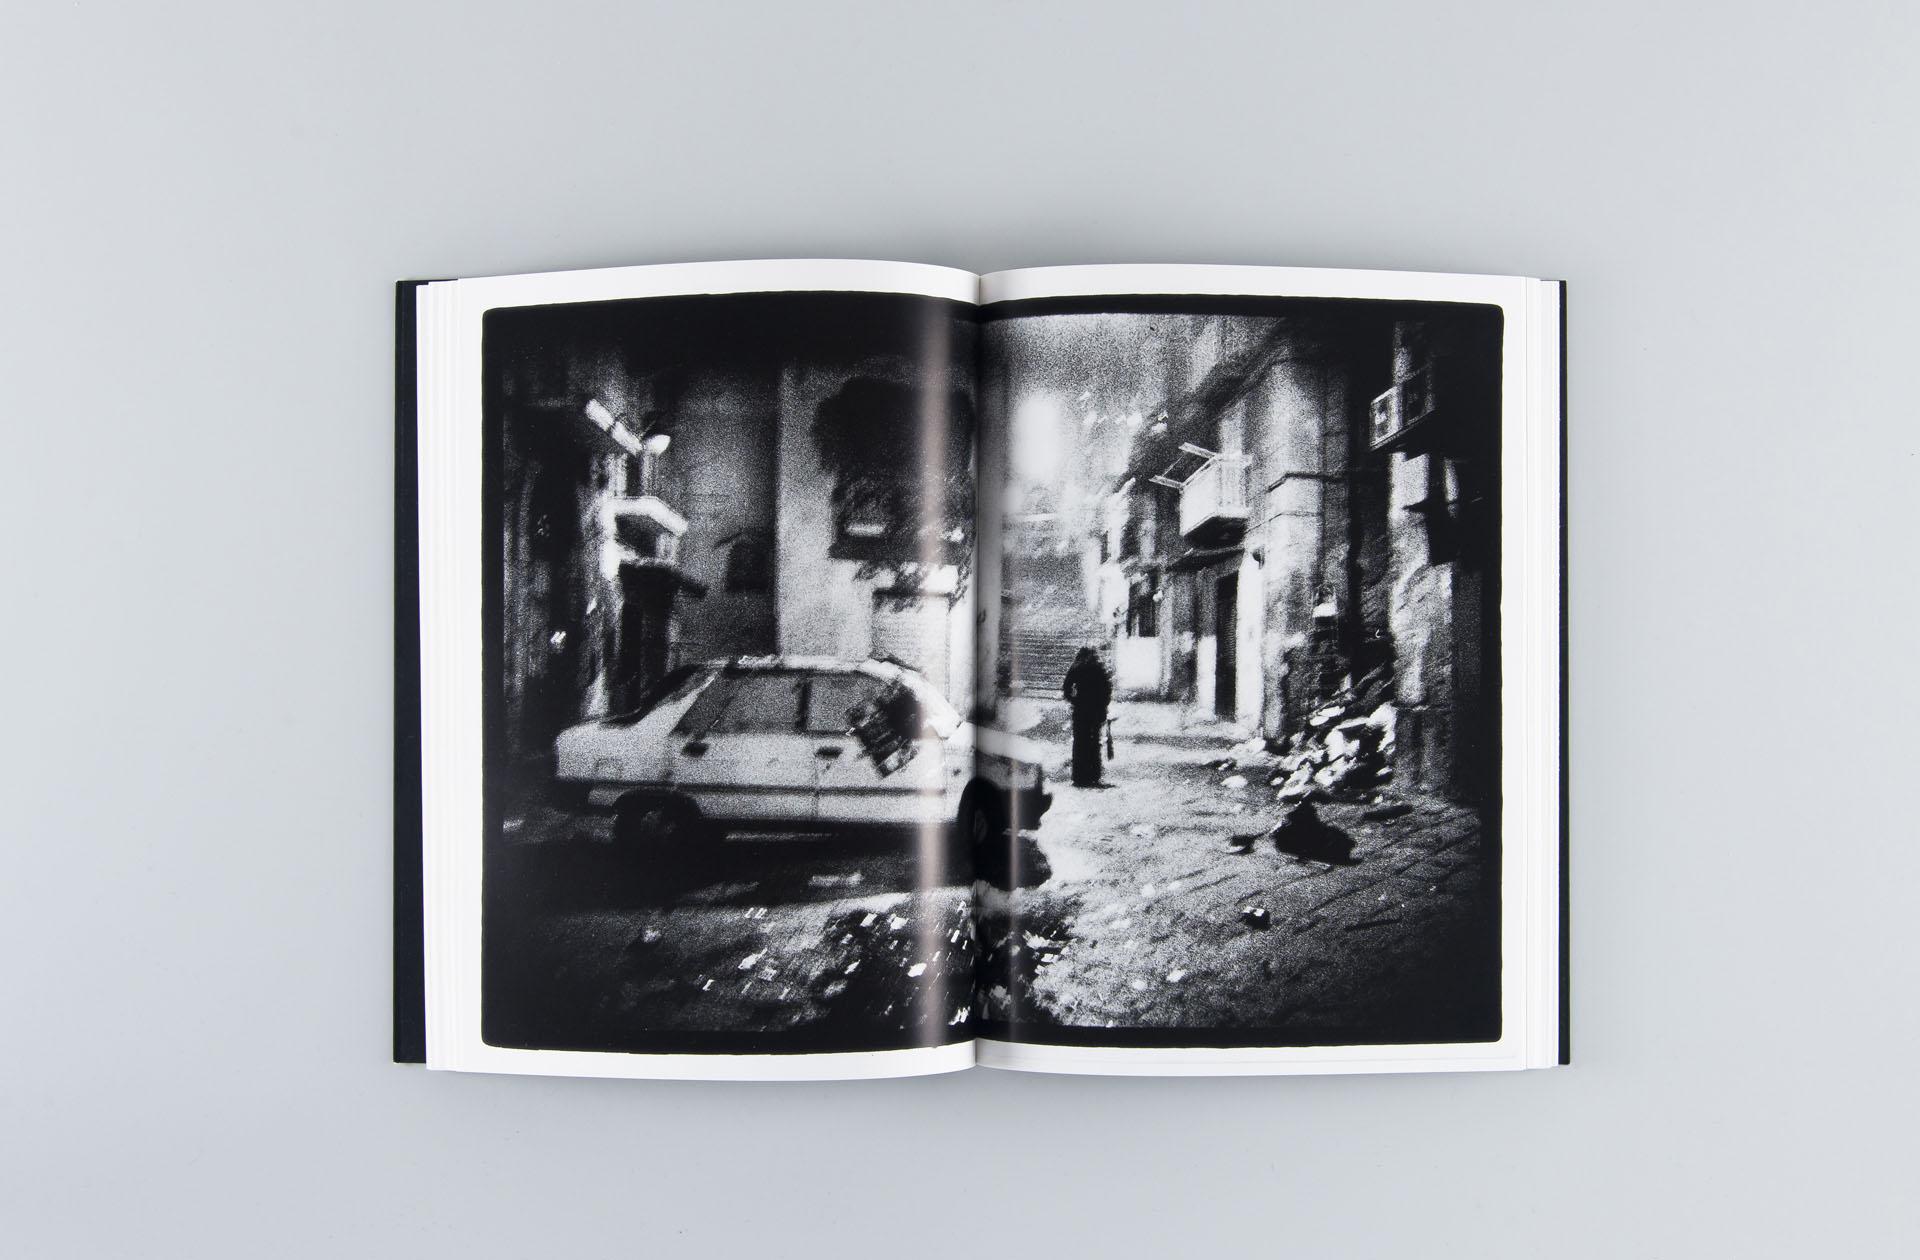 delpire-ACKERMAN-michael-fiction-006